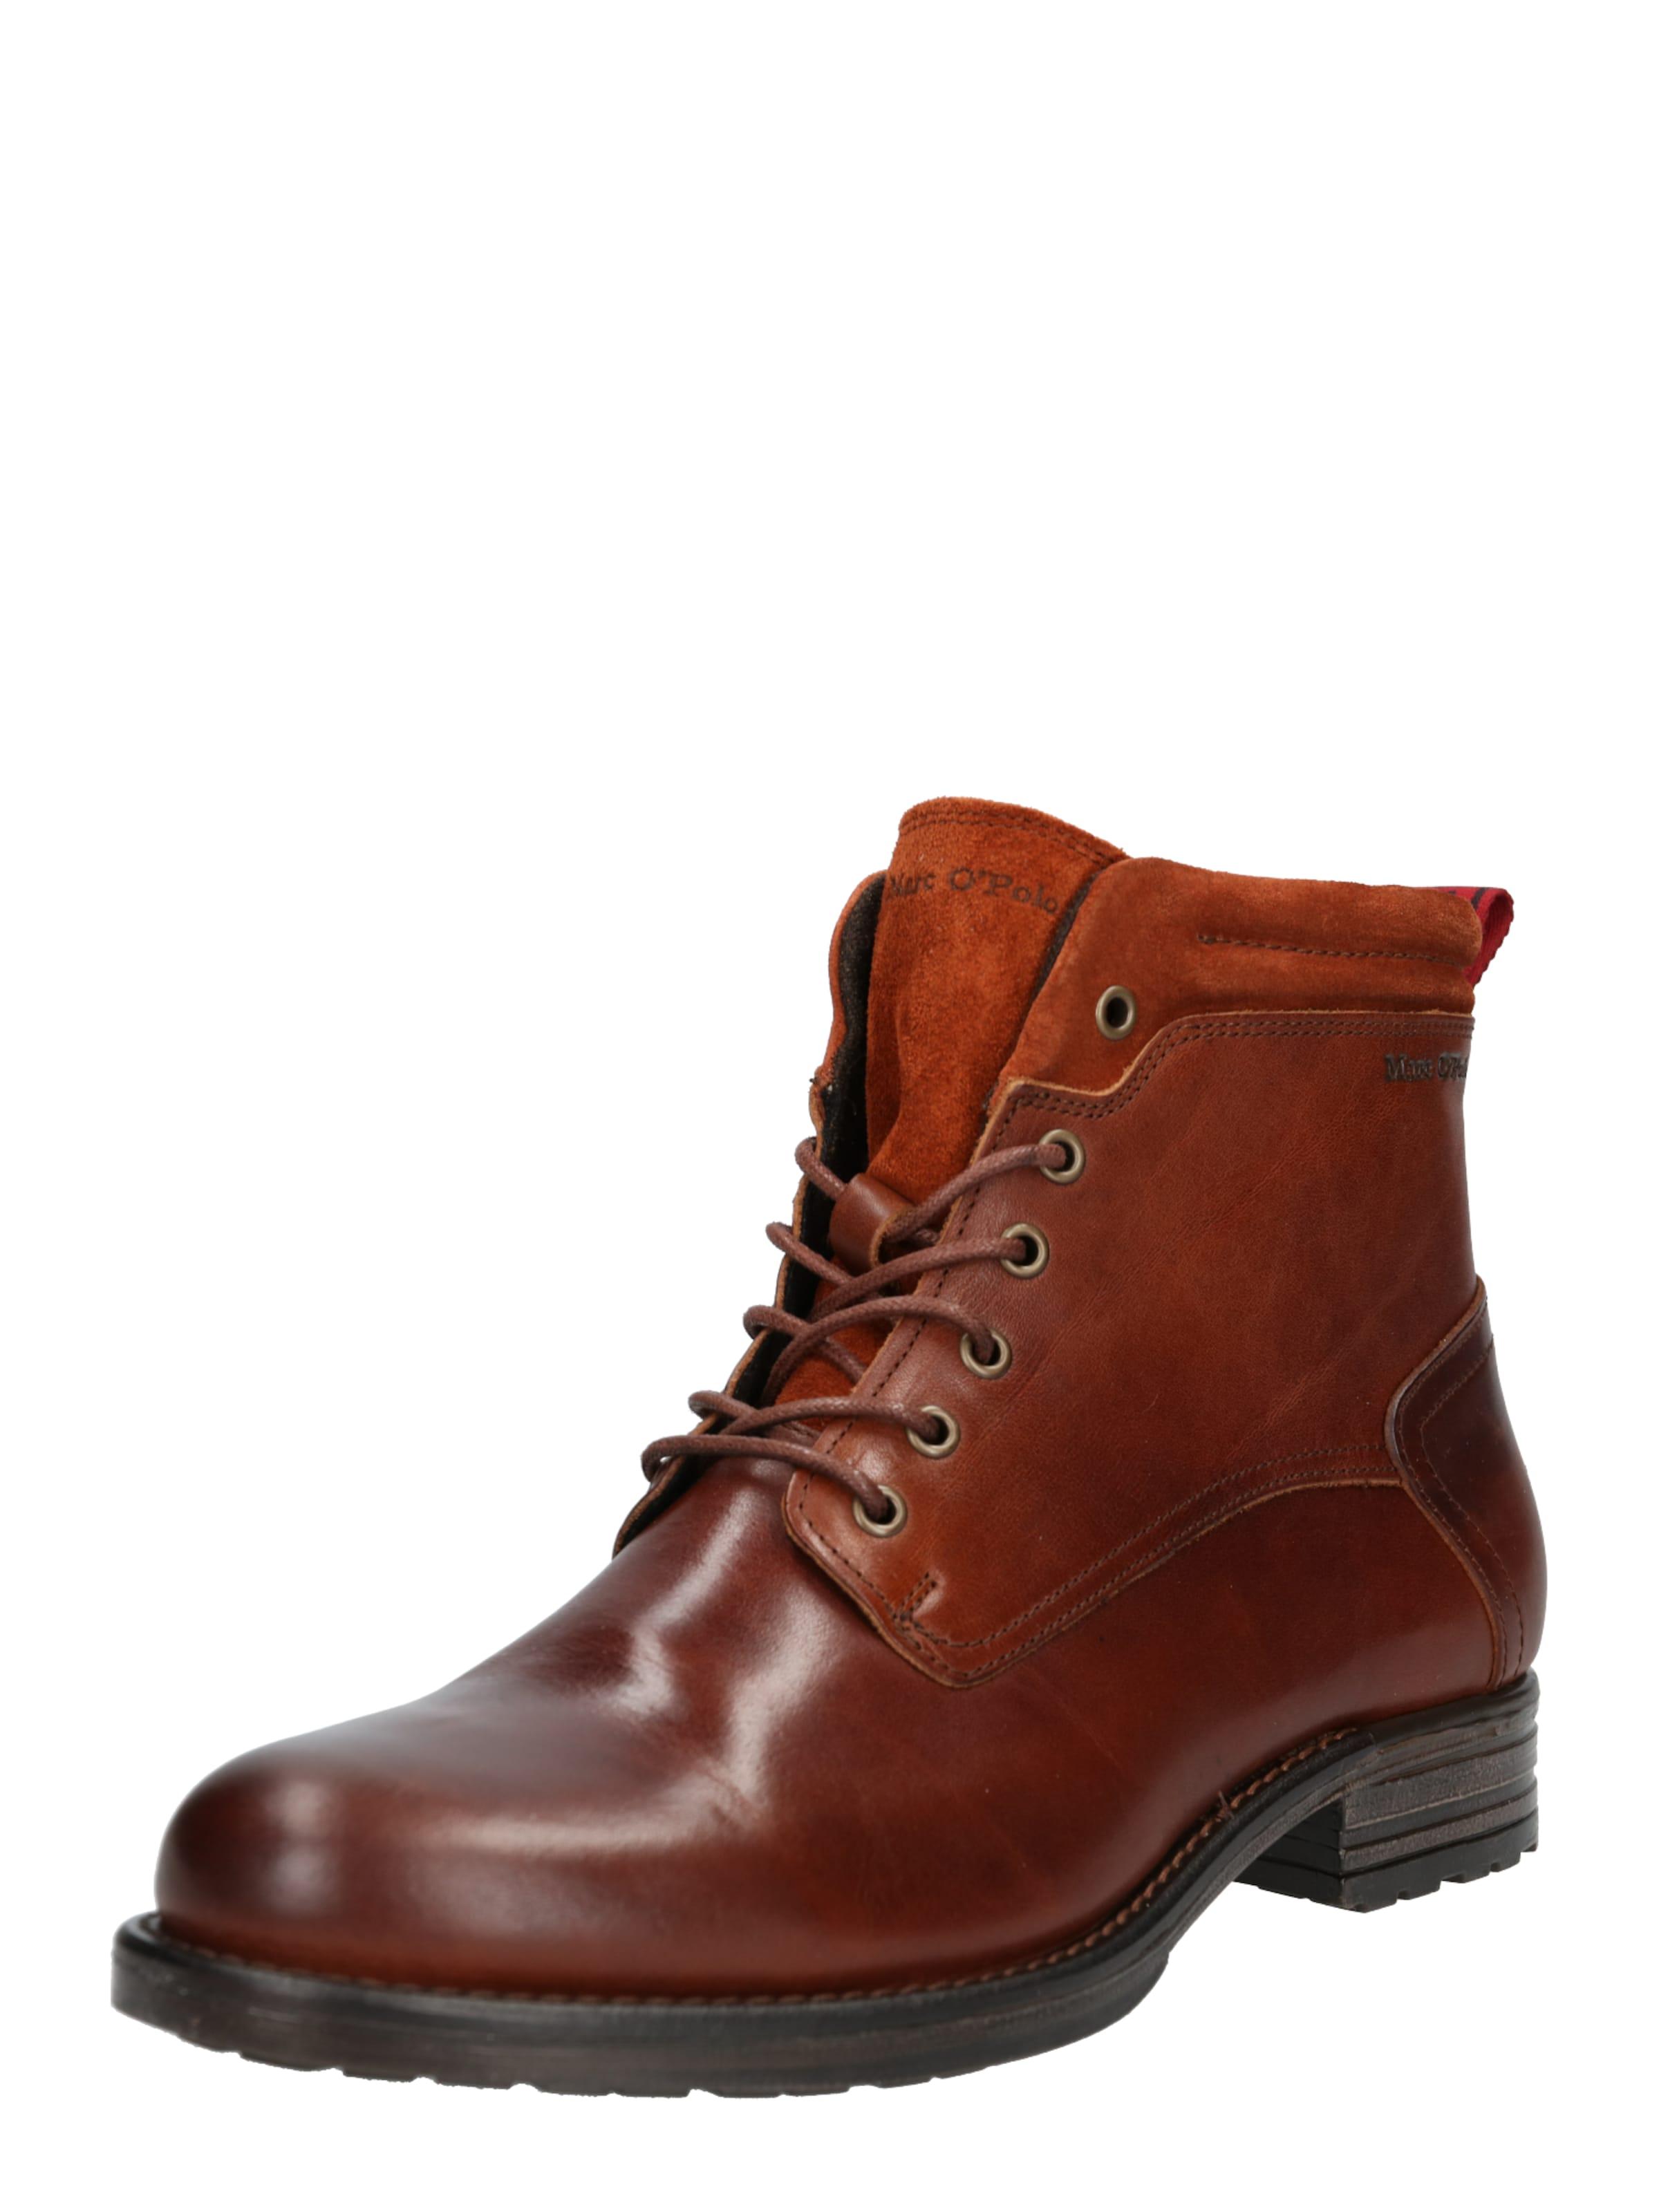 'lace' Cognac Marc O'polo In Boots O08NPXnwk